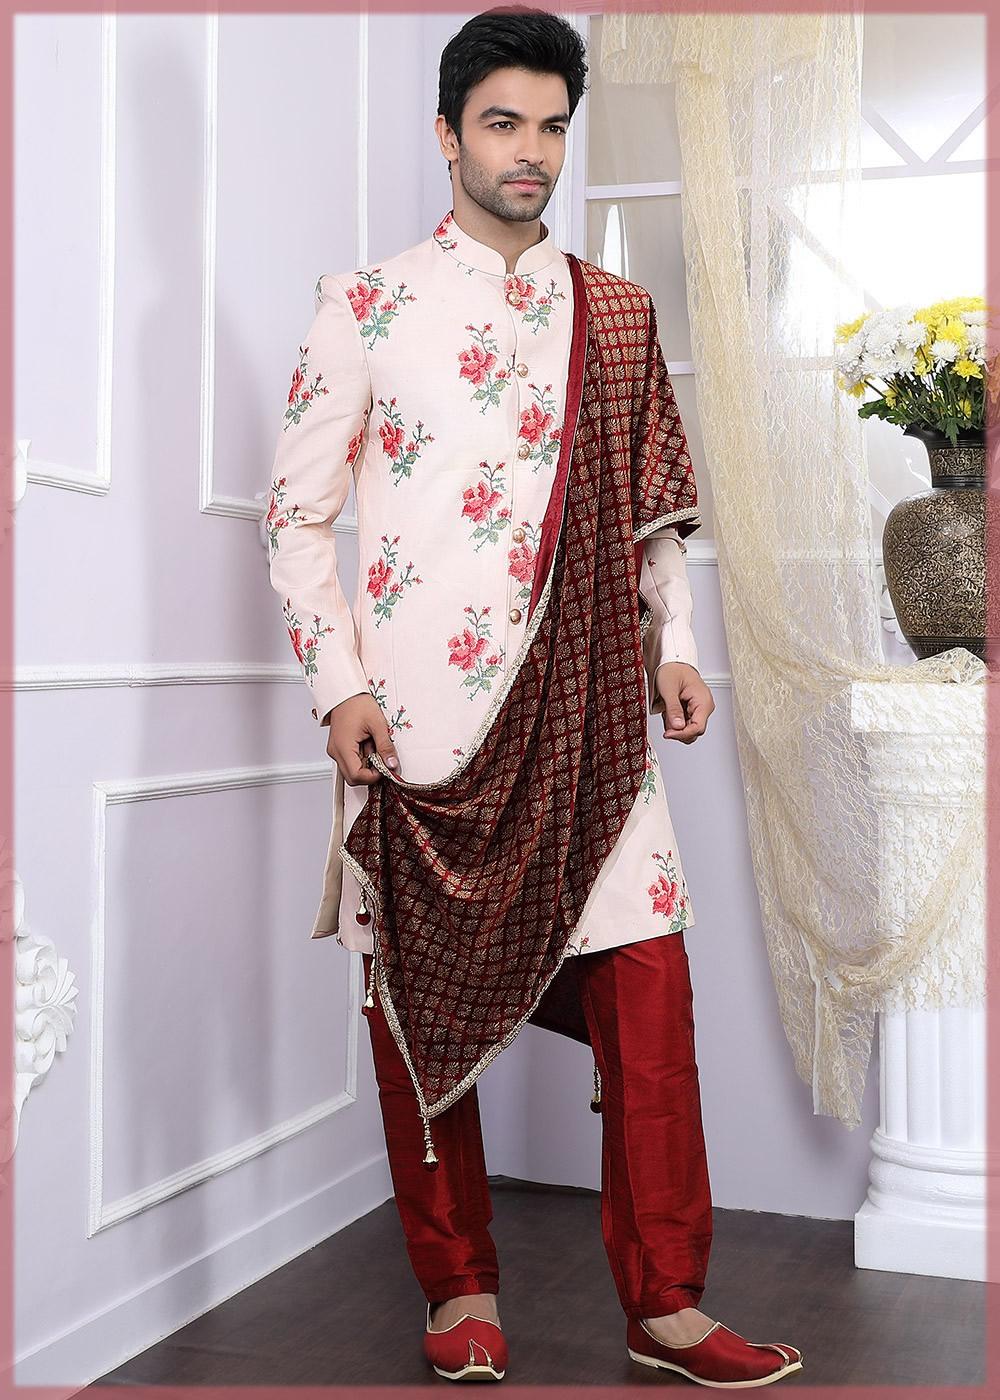 Floral printed sherwani with duppata